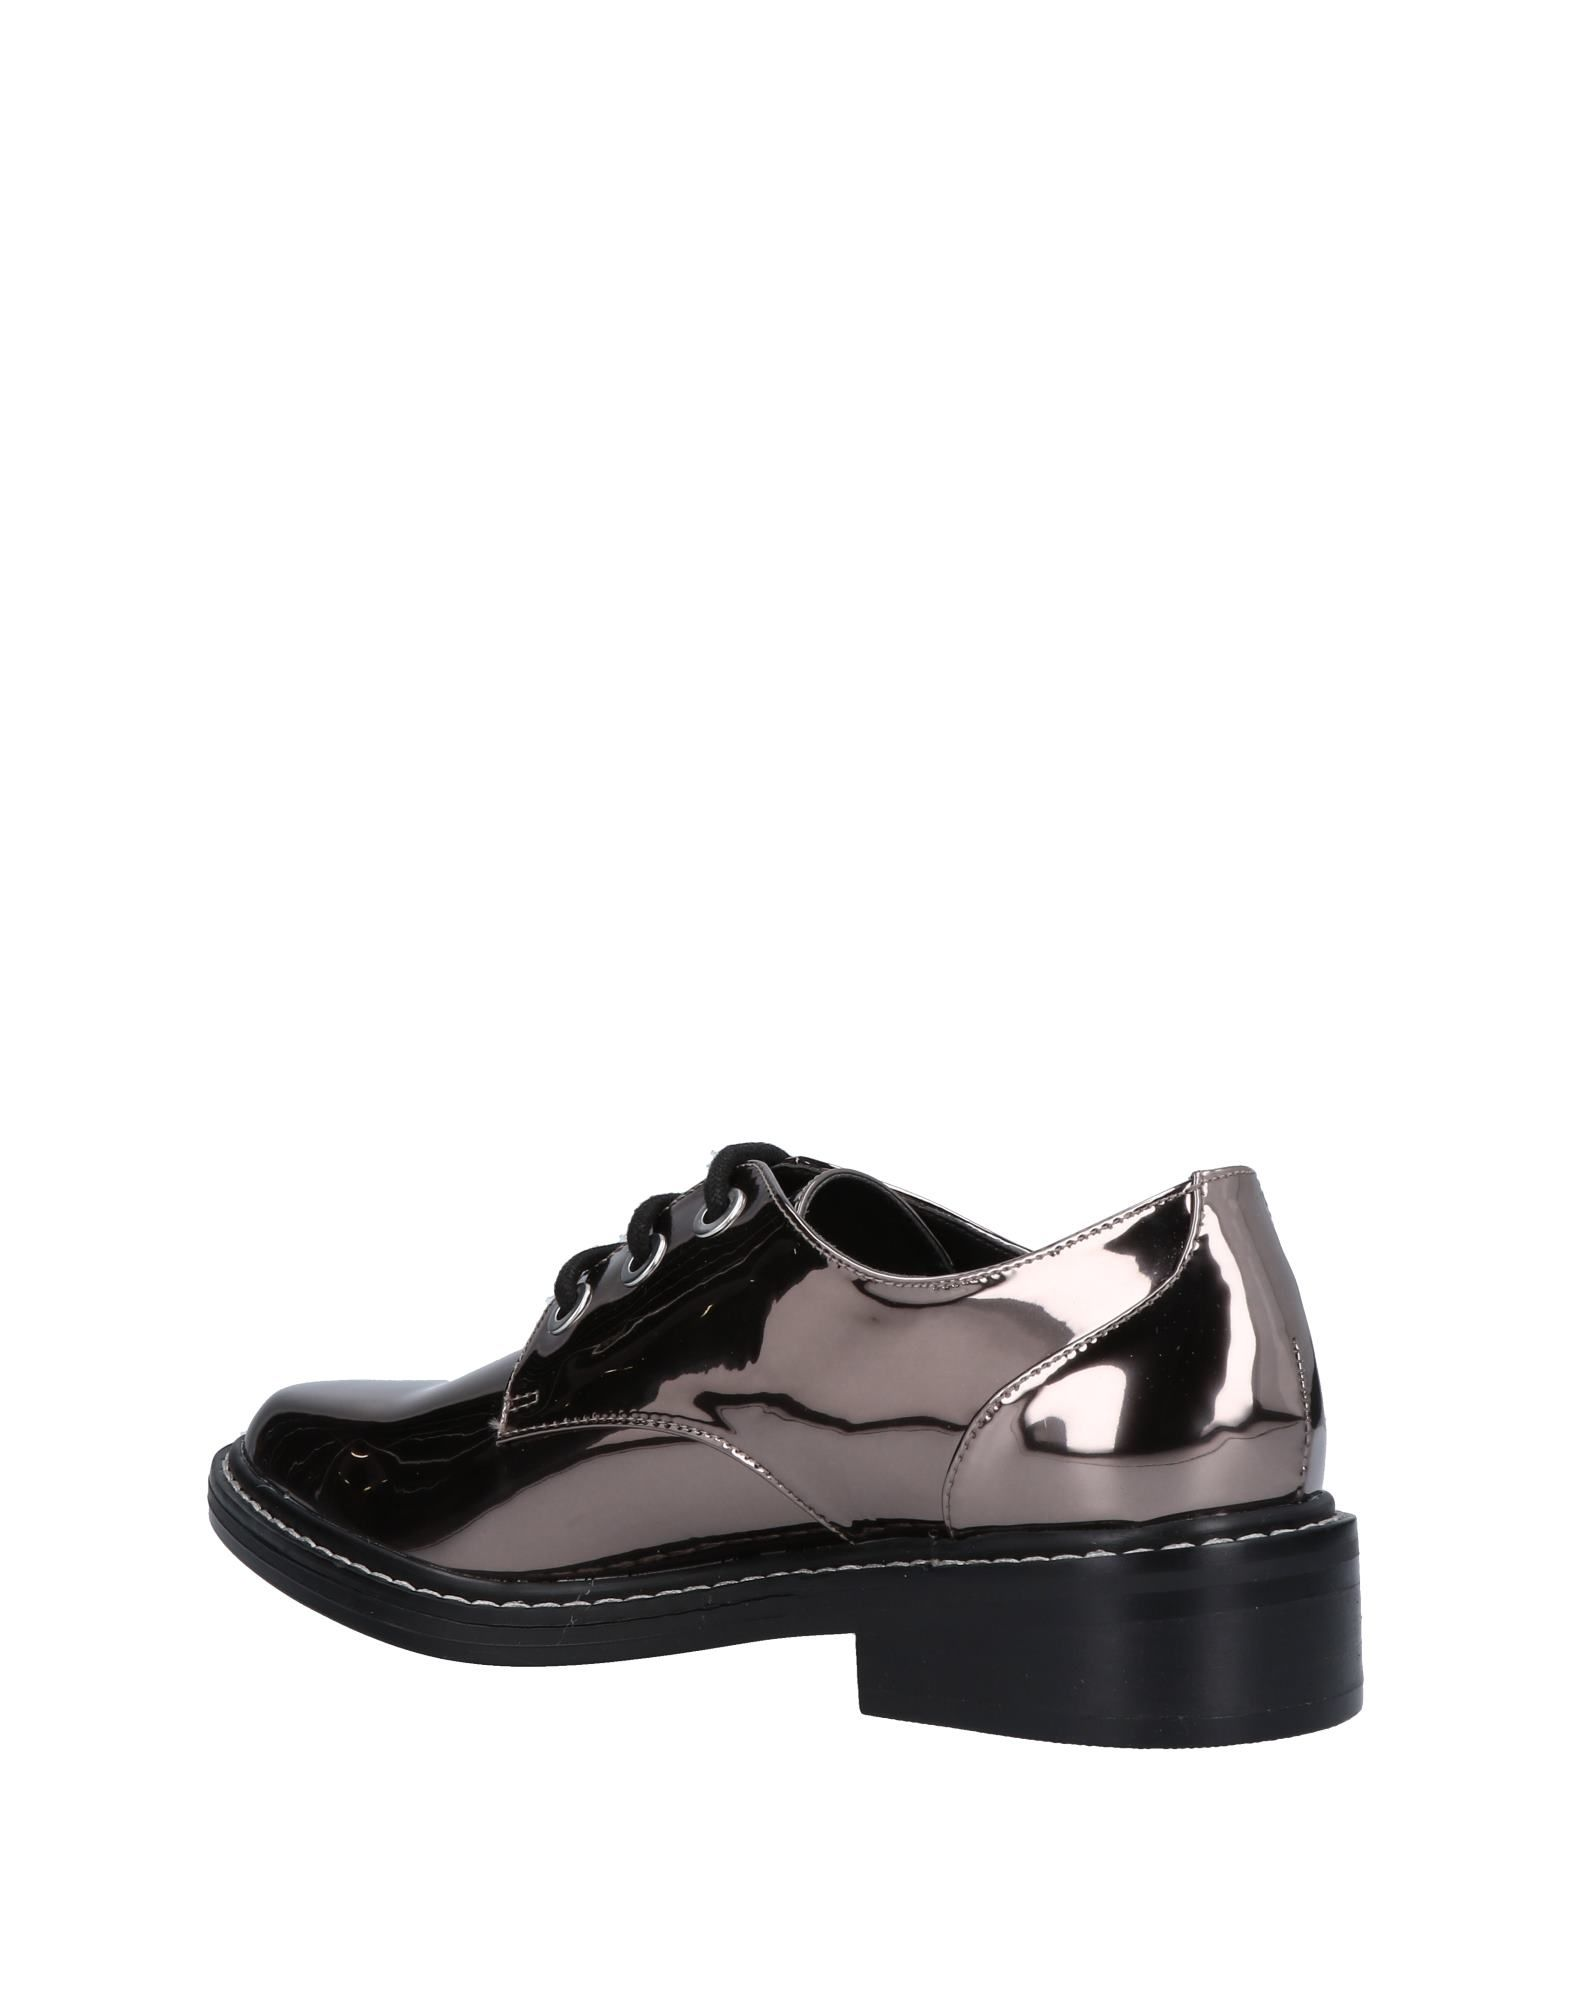 Chaussures À Lacets Steve Madden Femme - Chaussures À Lacets Steve Madden sur